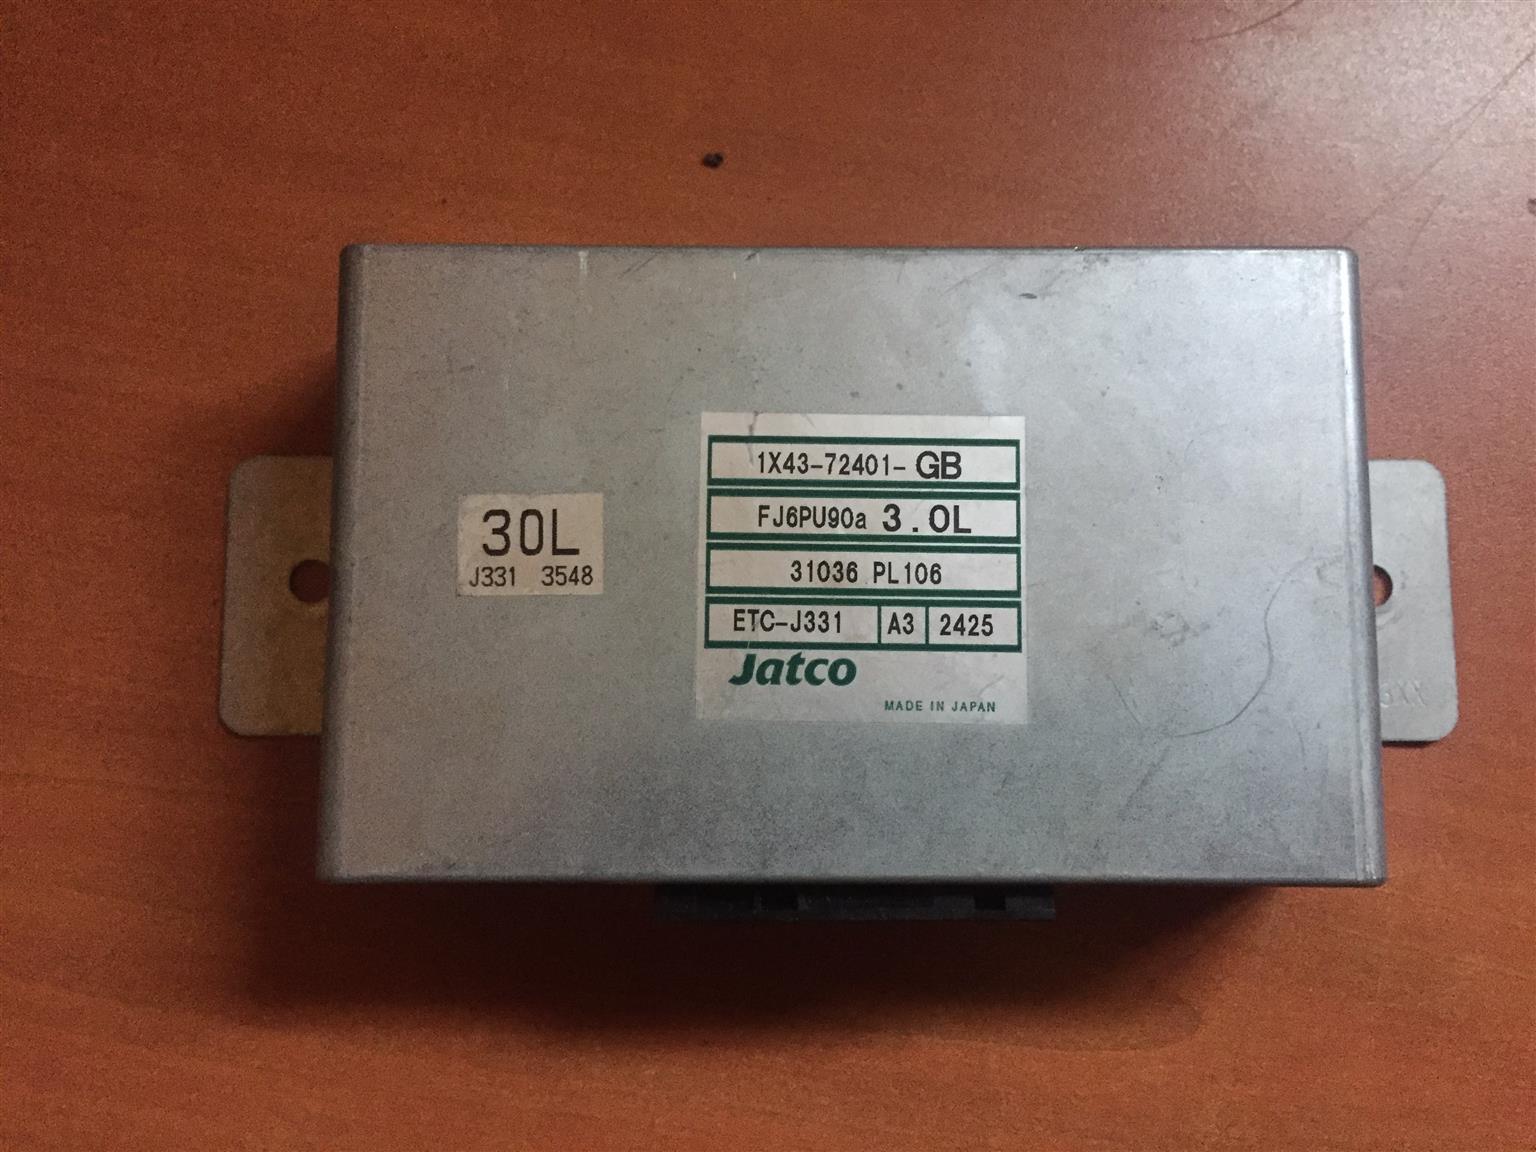 Jaguar Jetco box for gear box for sale